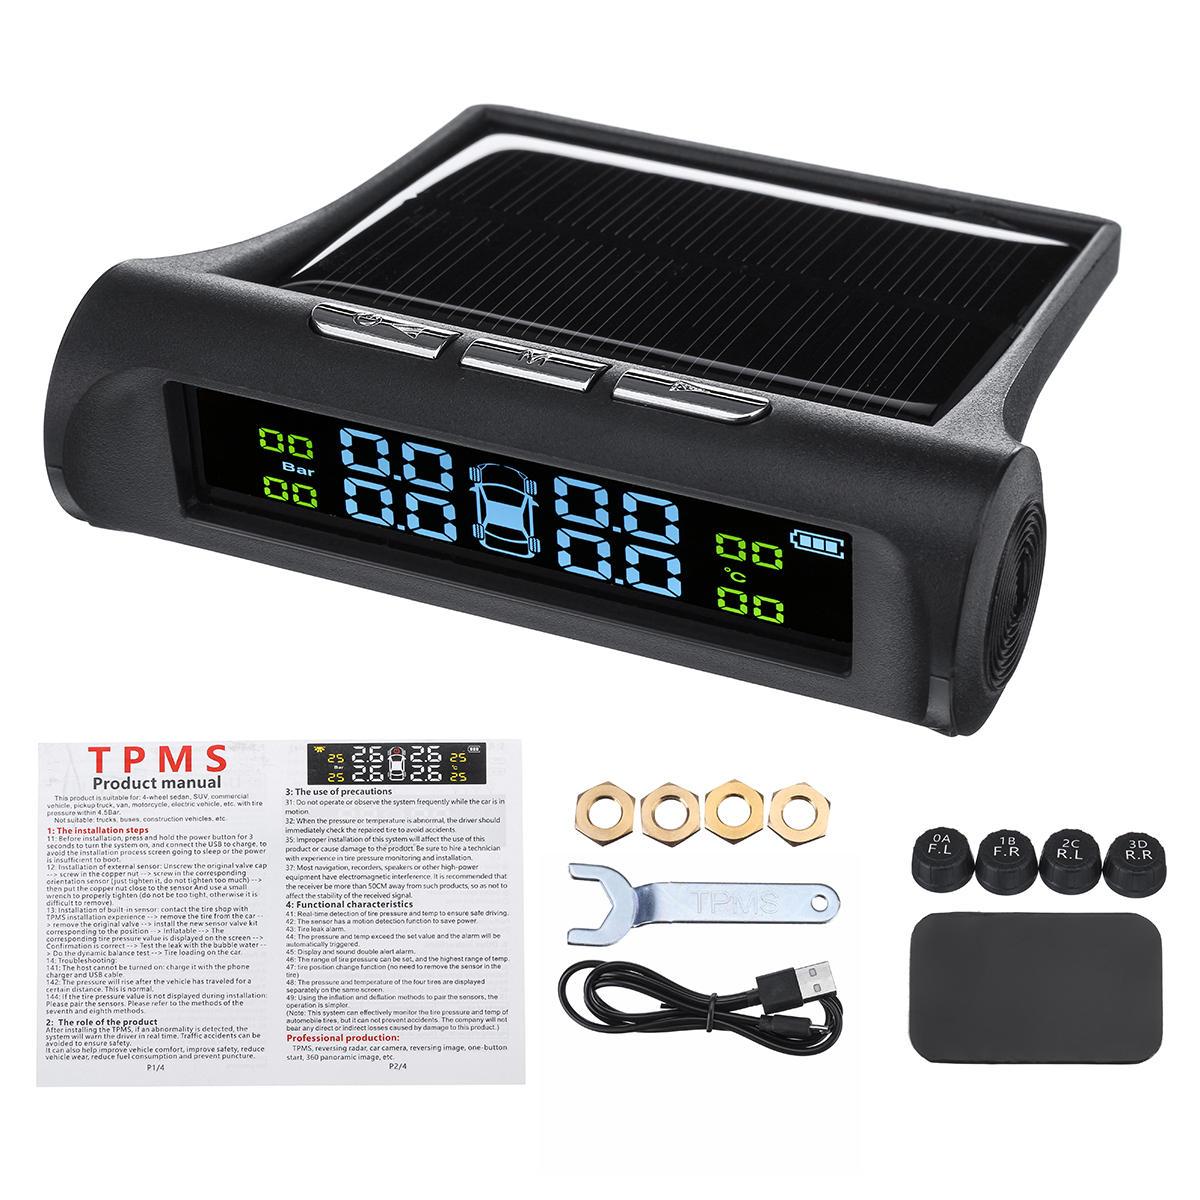 Wireless Solar TPMS Car Tire Pressure Monitor System + 4 External Sensors 0-5 Bar